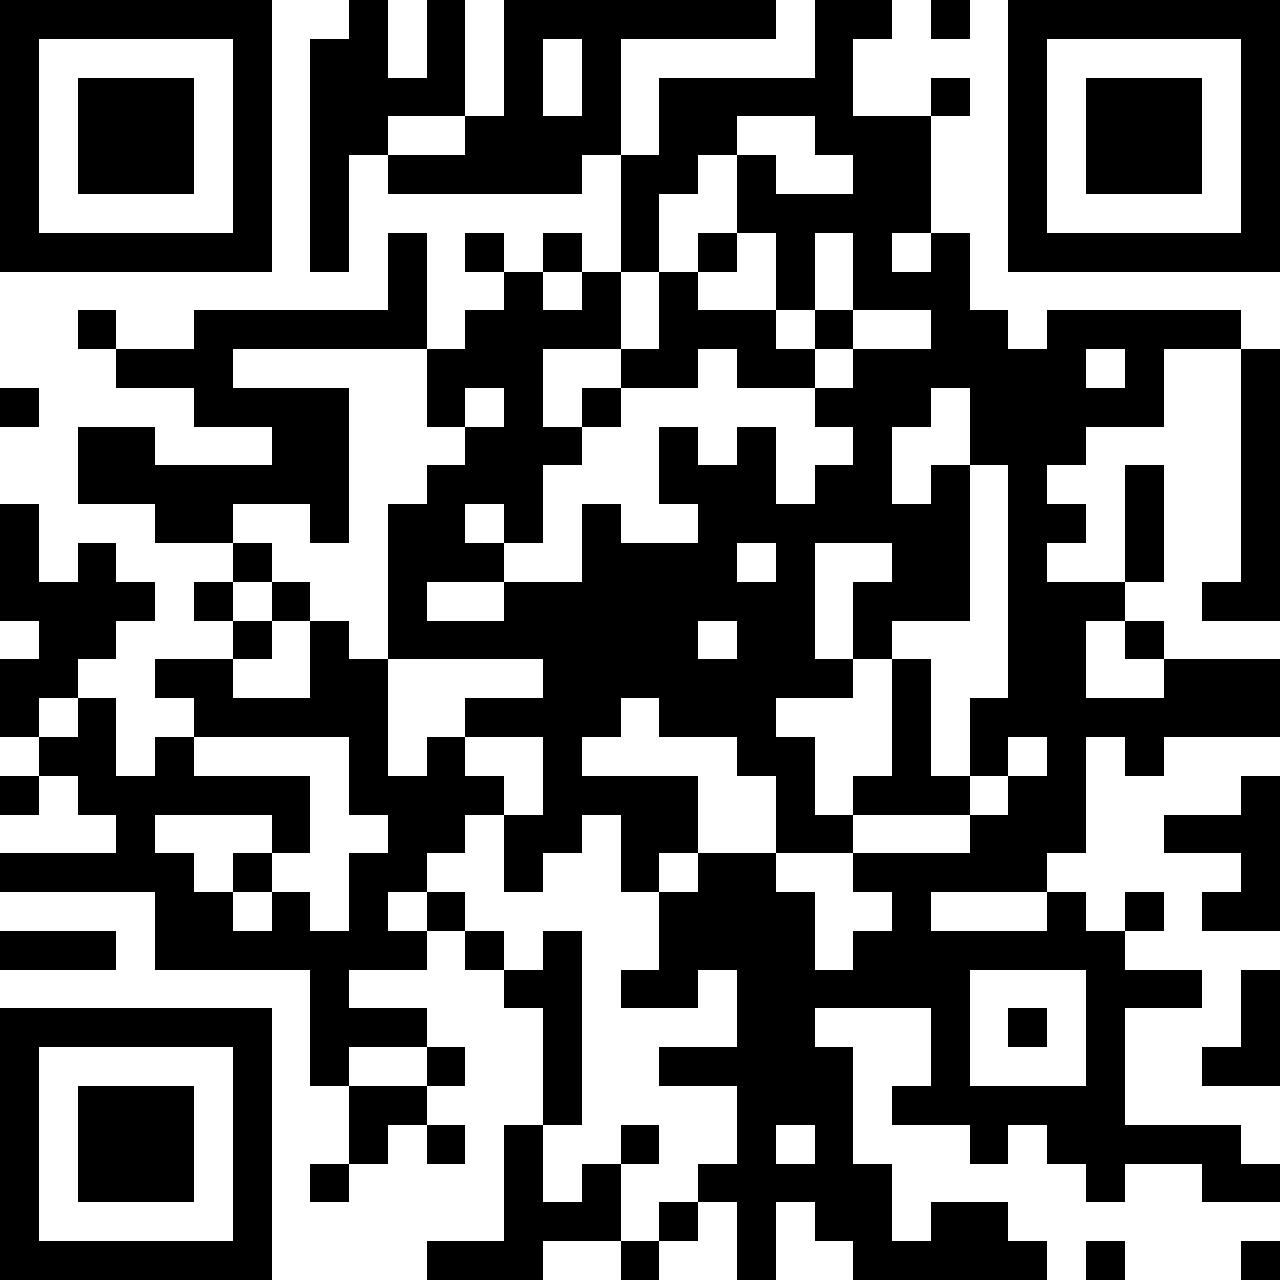 2021_SHRC_Registration Code.png